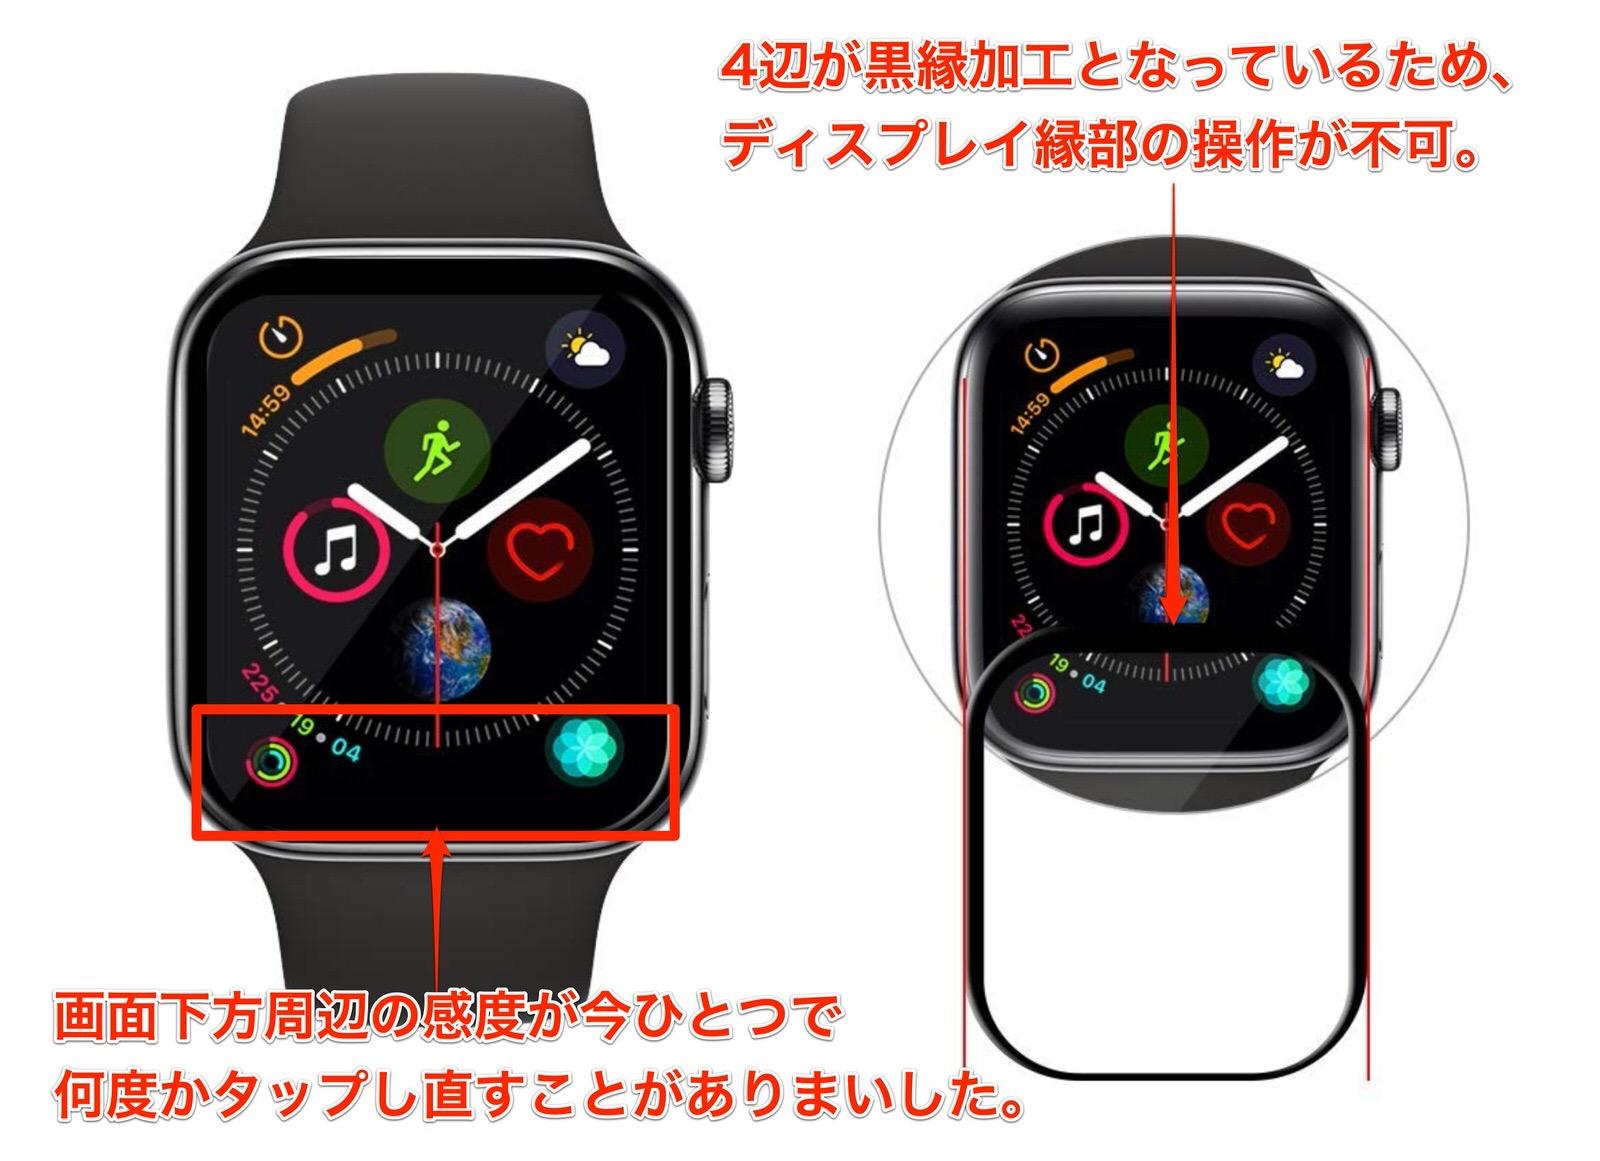 Apple Watch Series 4-1